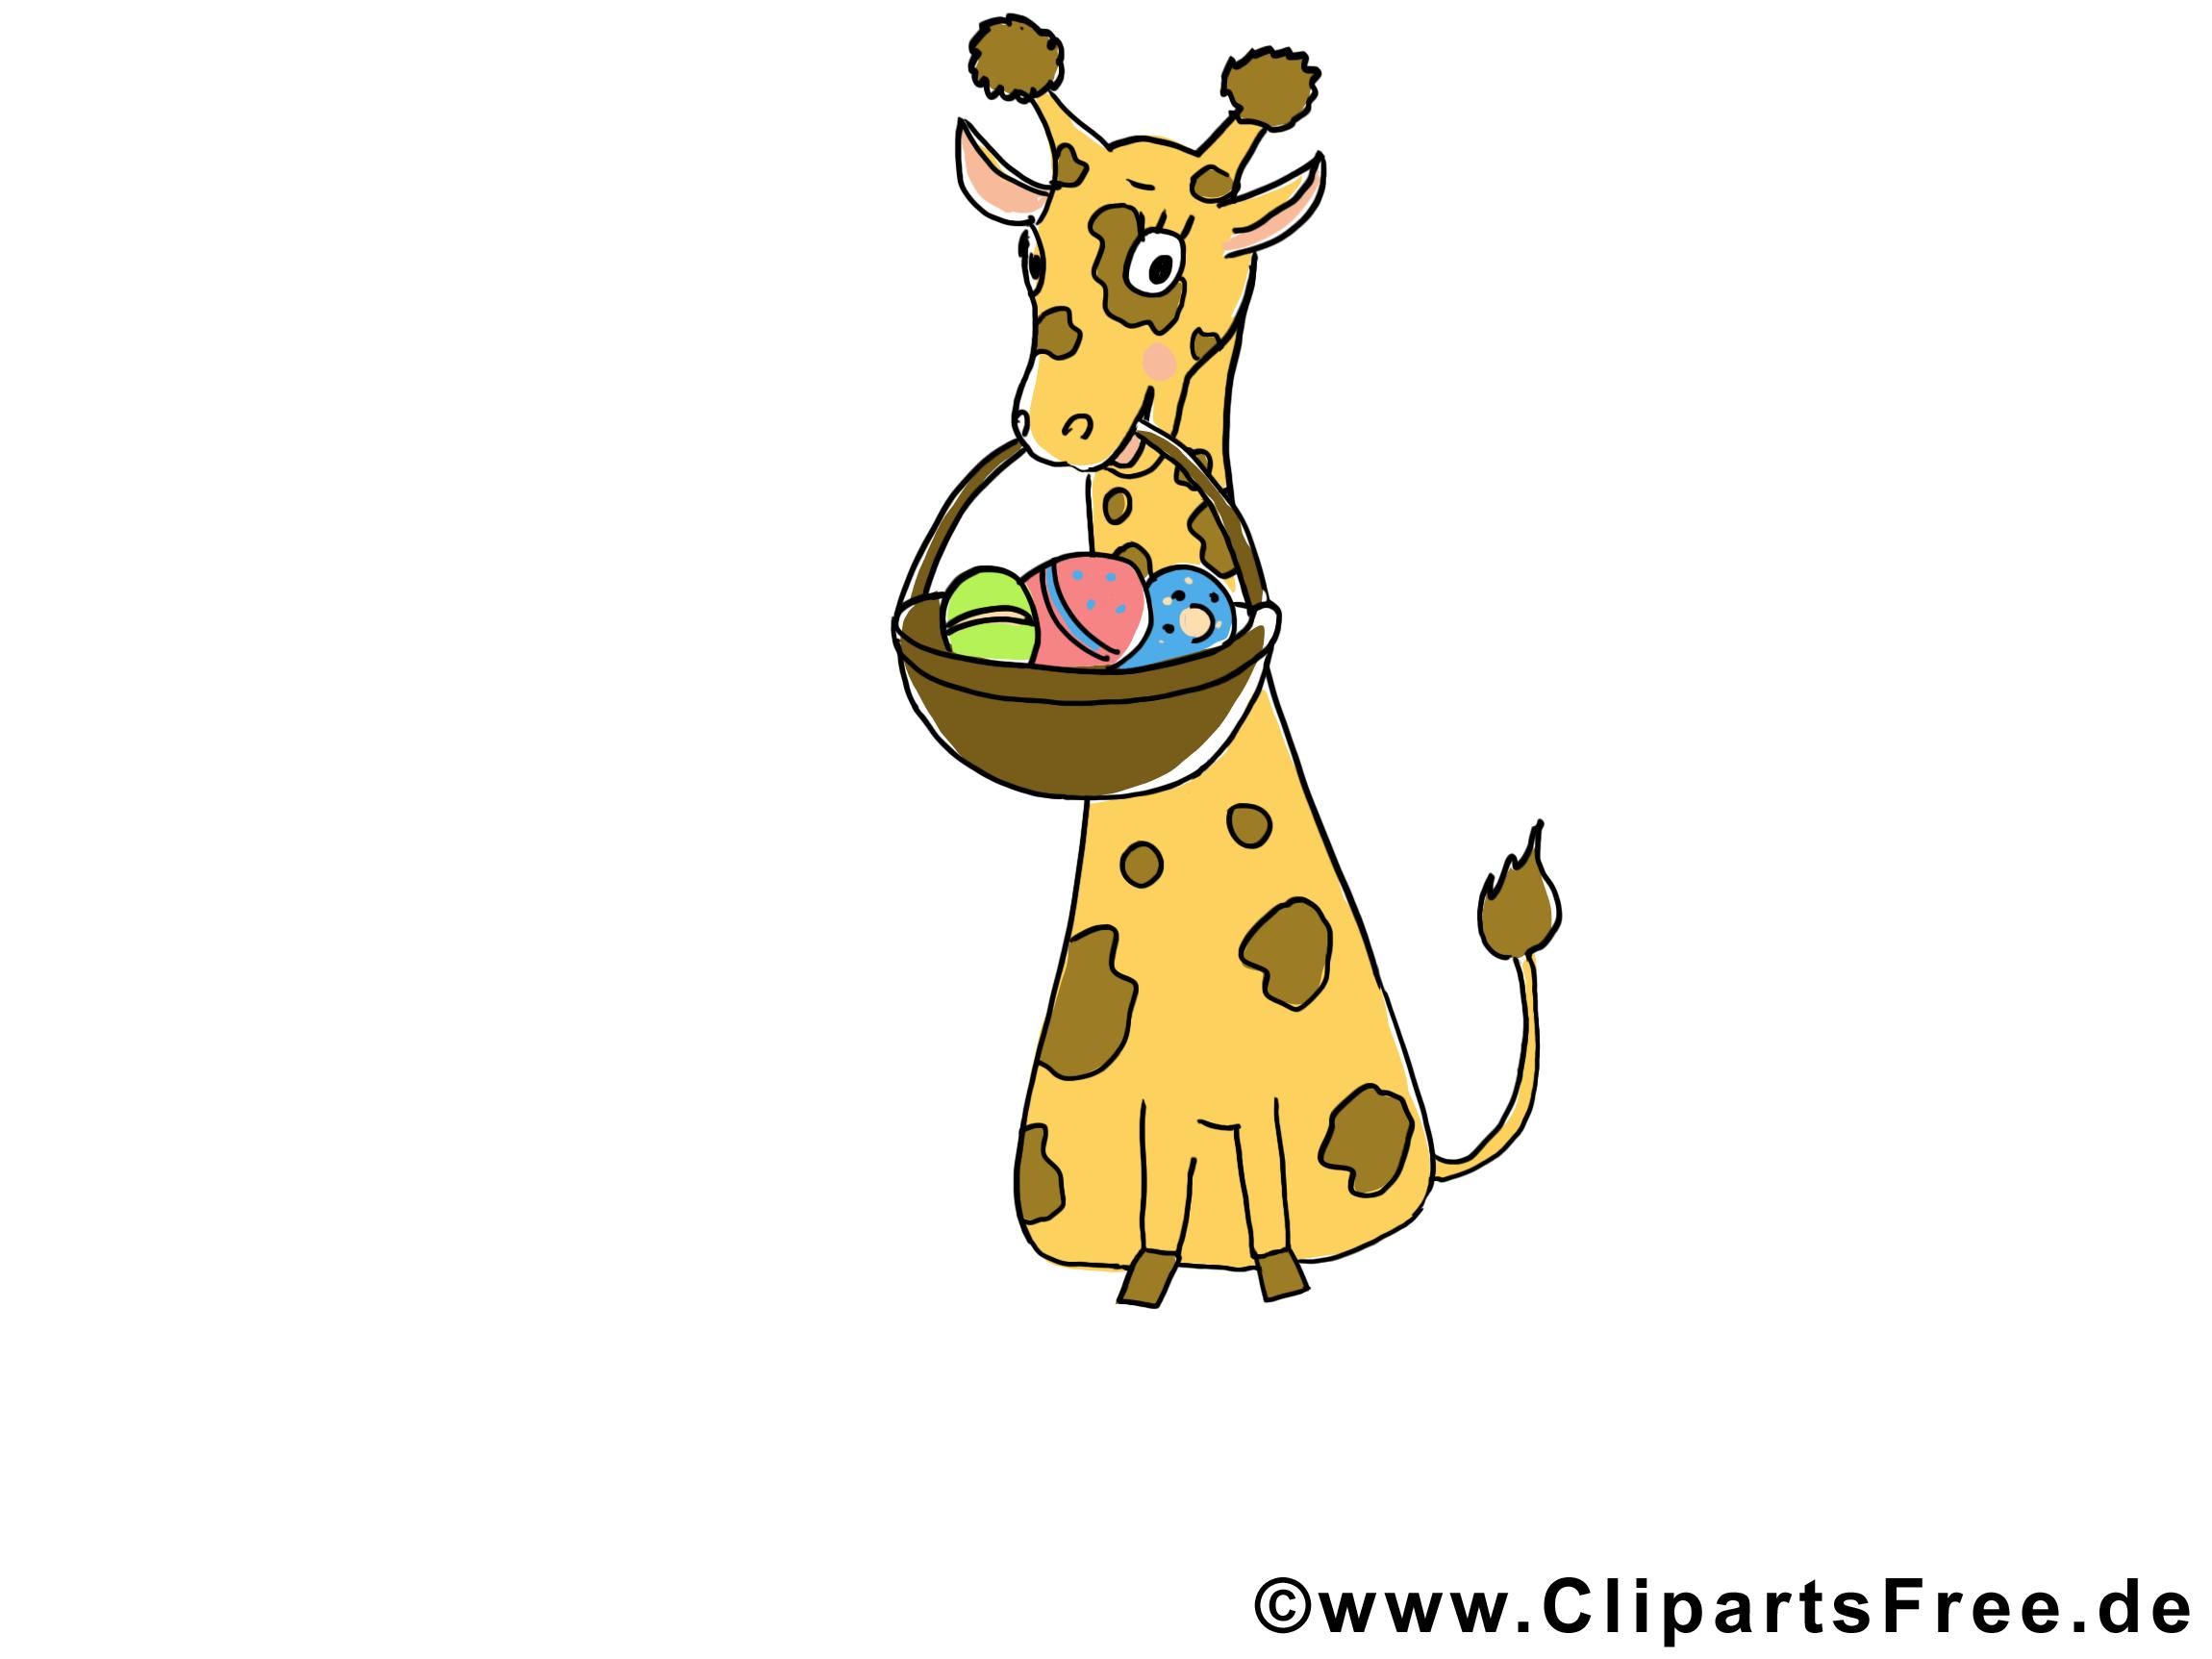 Giraffe Clipart Tiere lustig